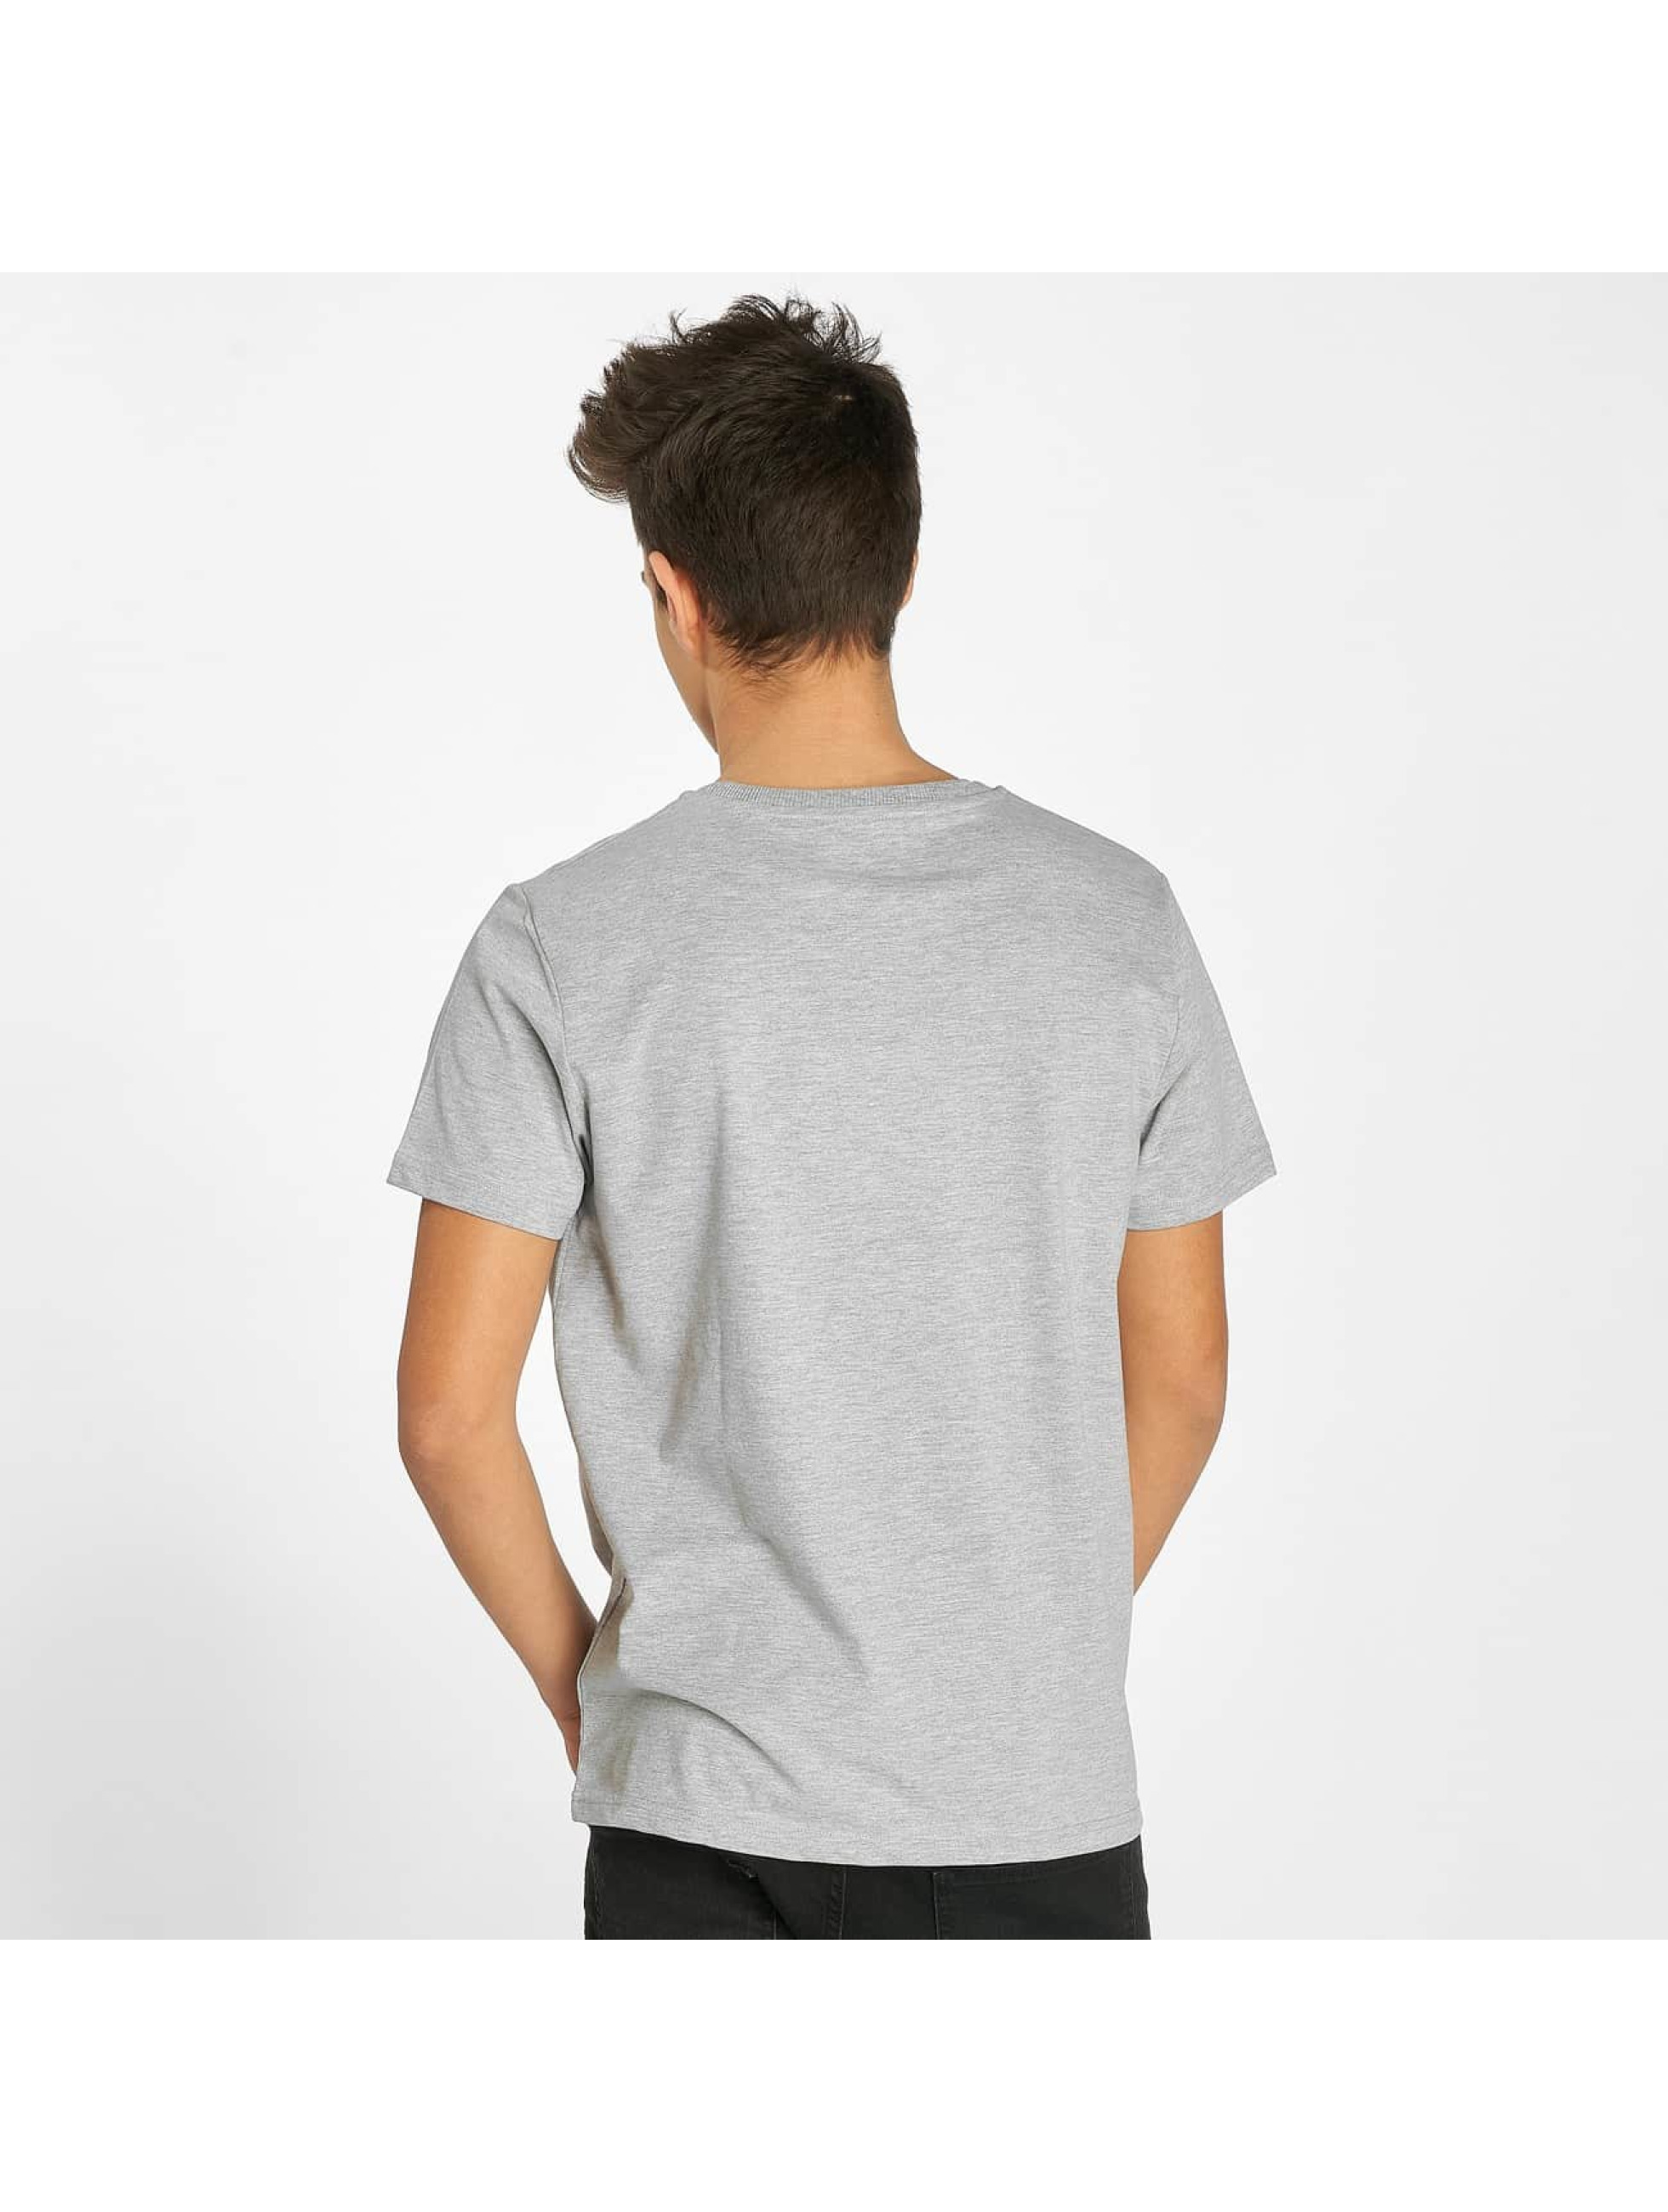 Kulte t-shirt Corpo grijs